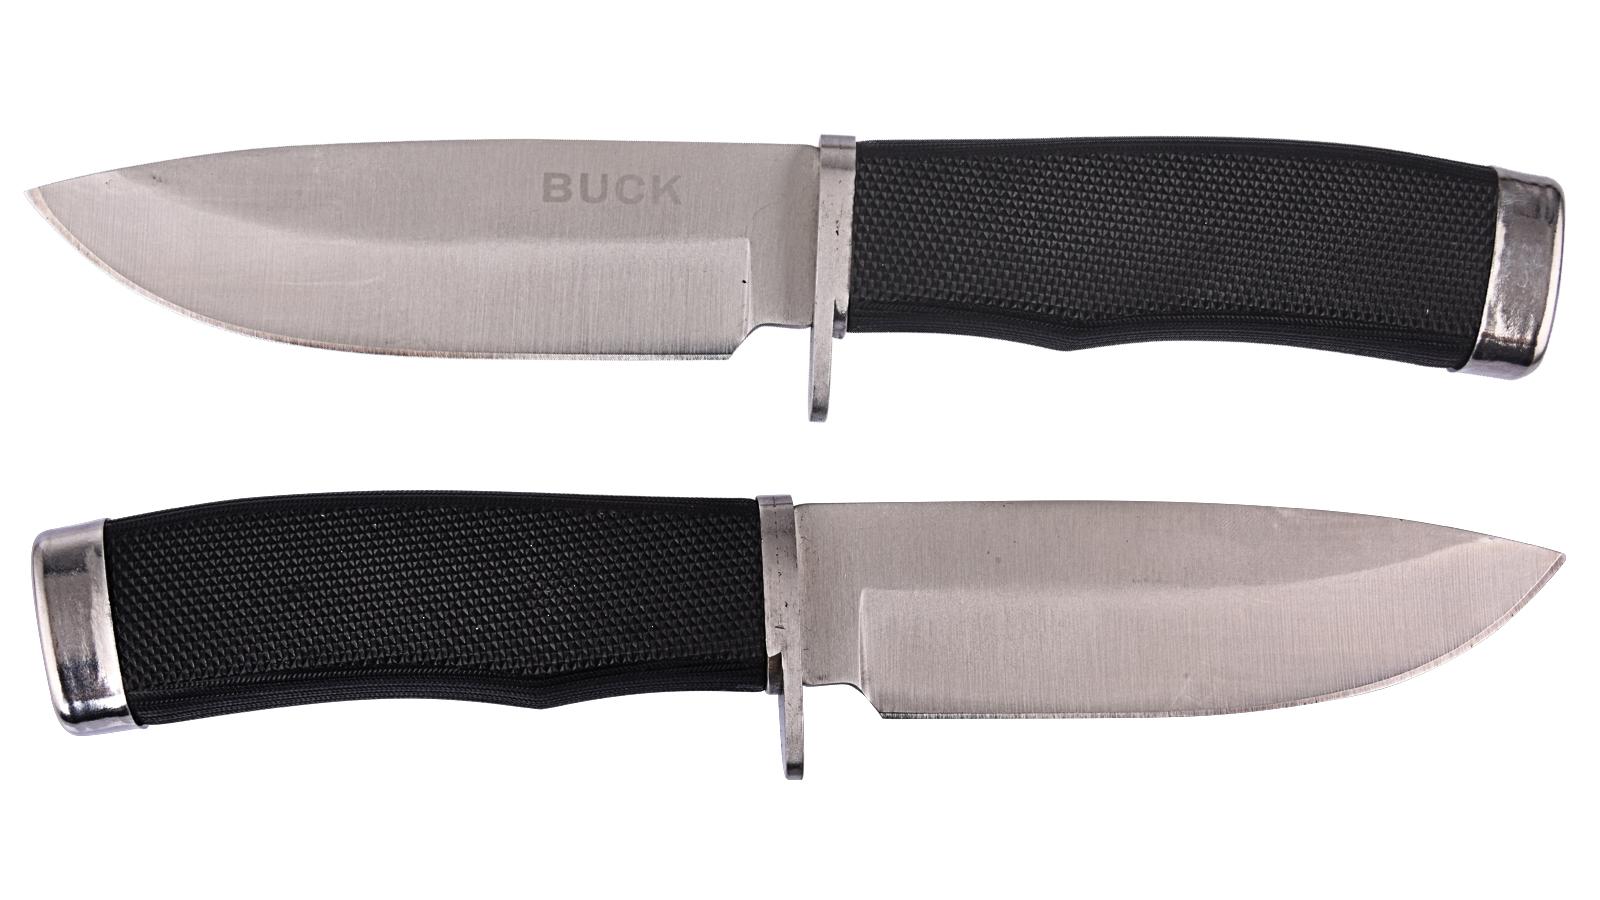 Нож BUCK 009 - купить онлайн